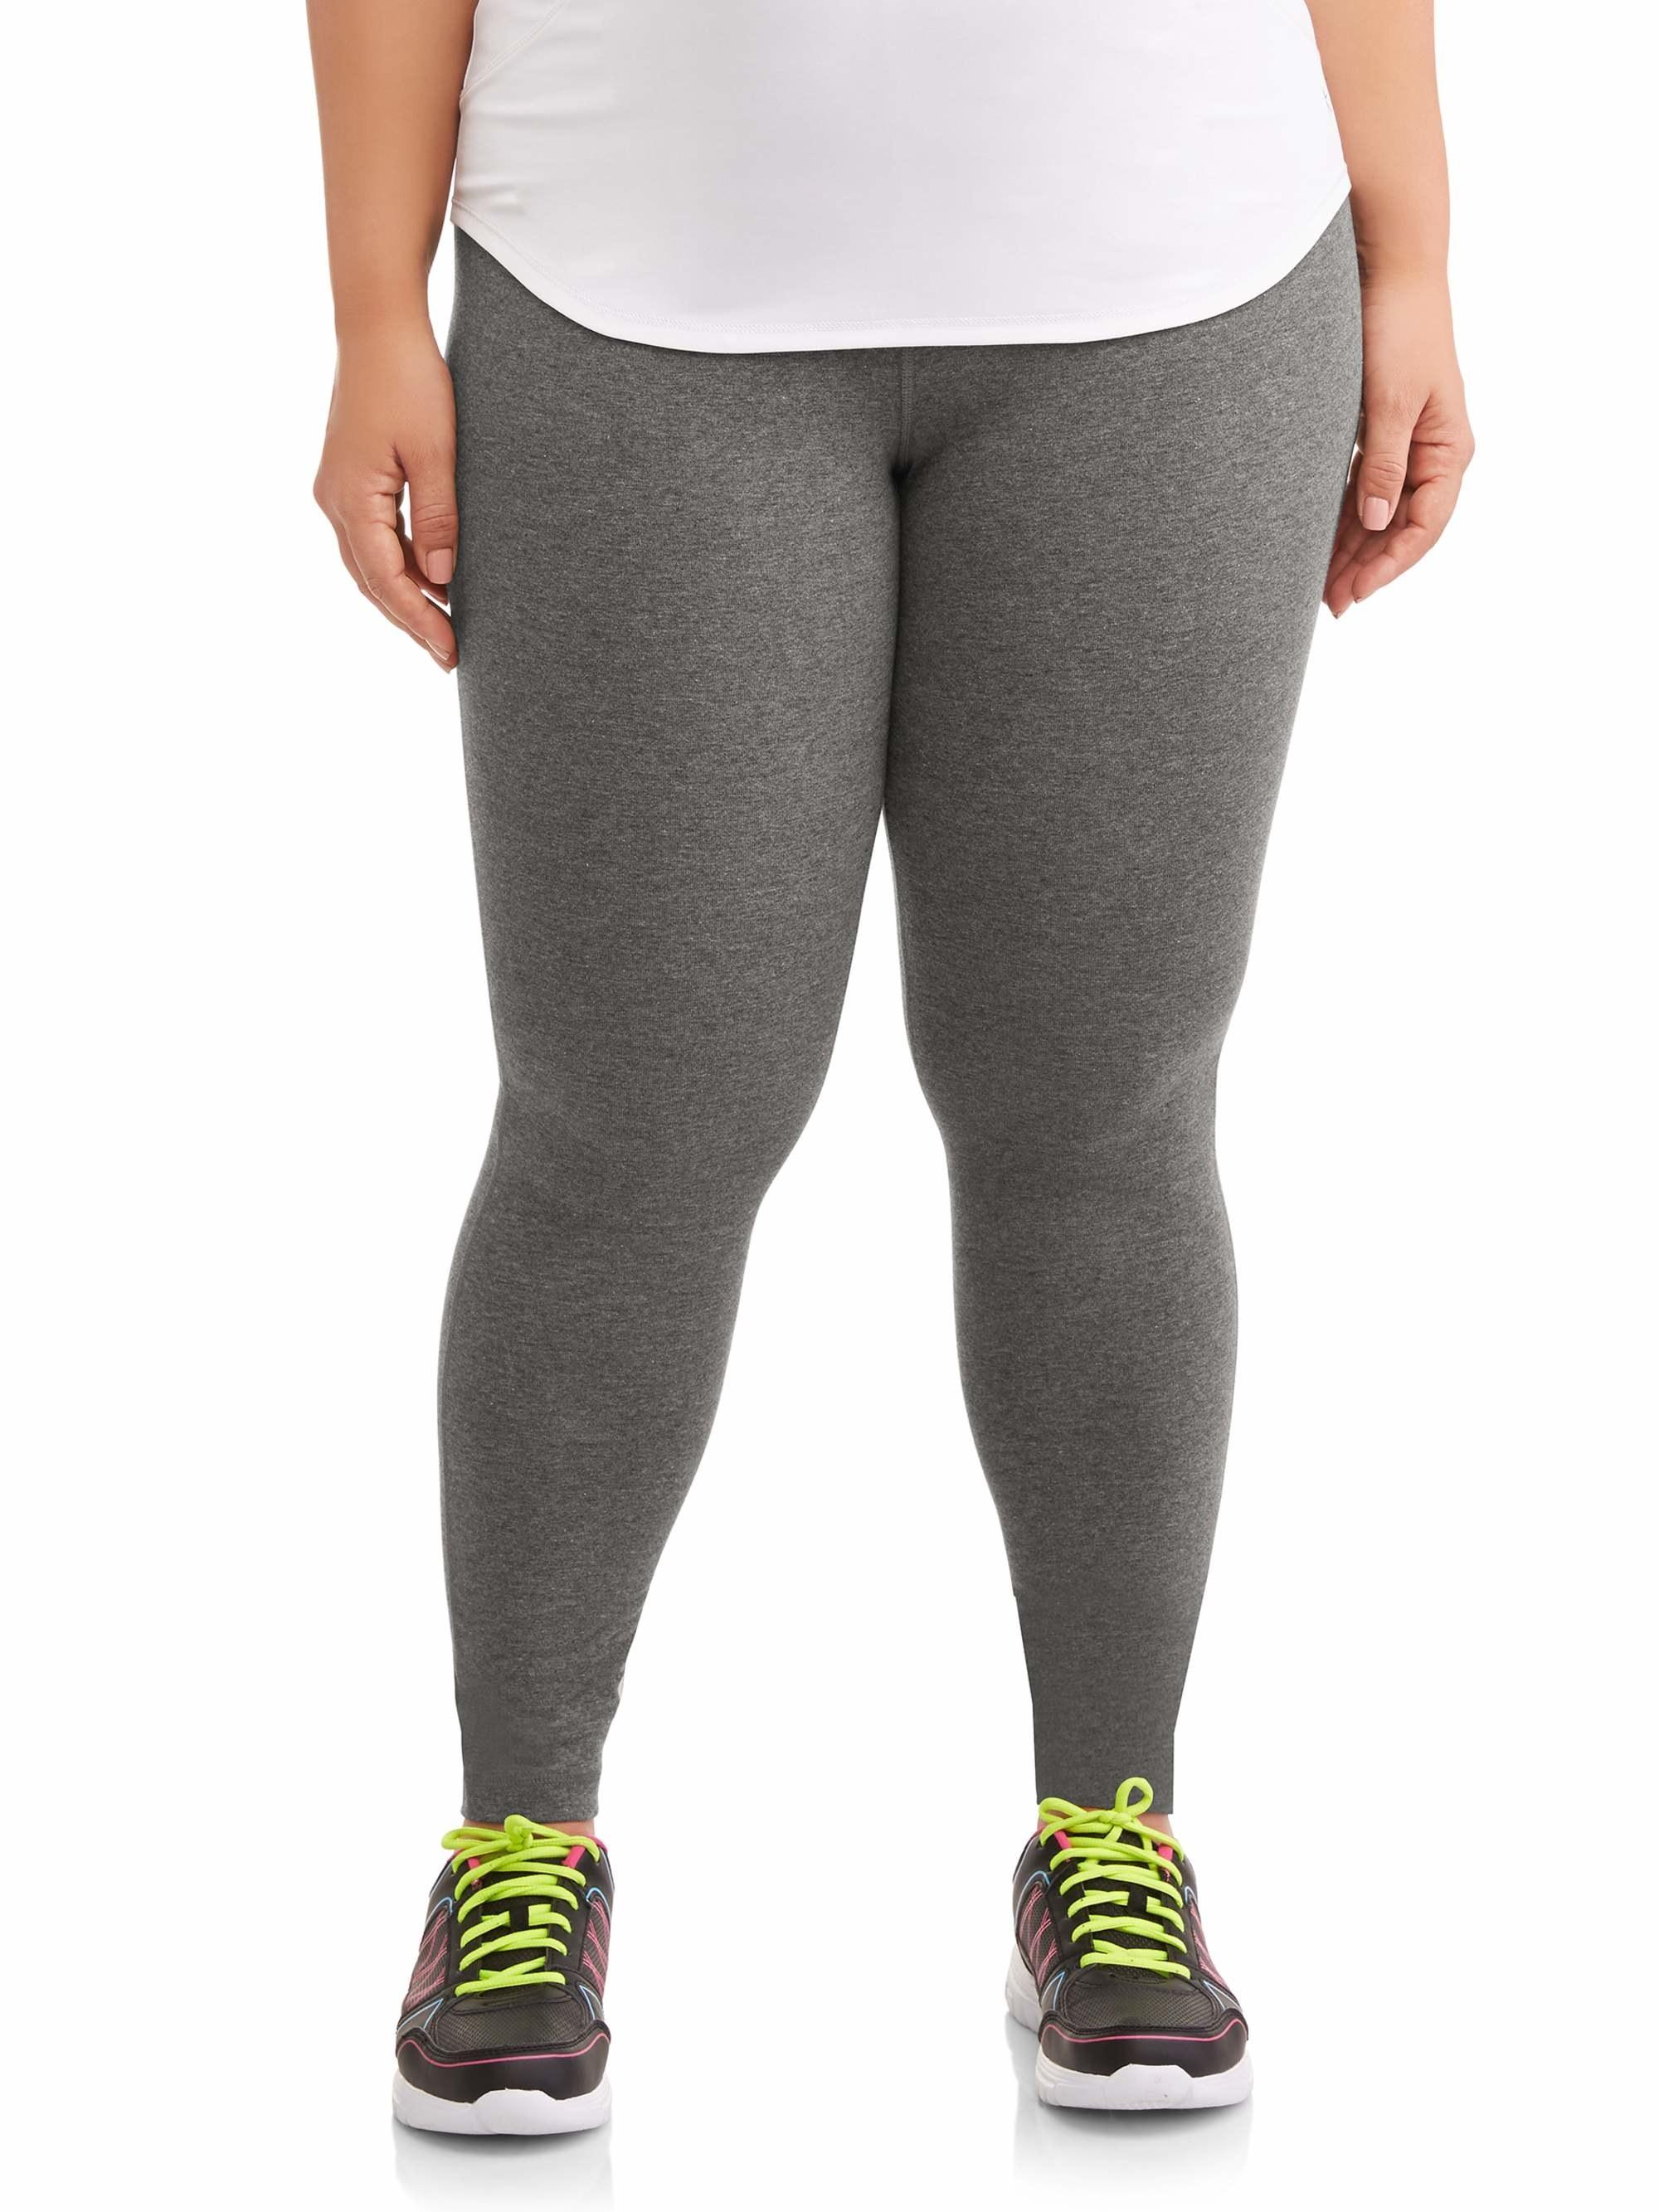 model wearing gray leggings